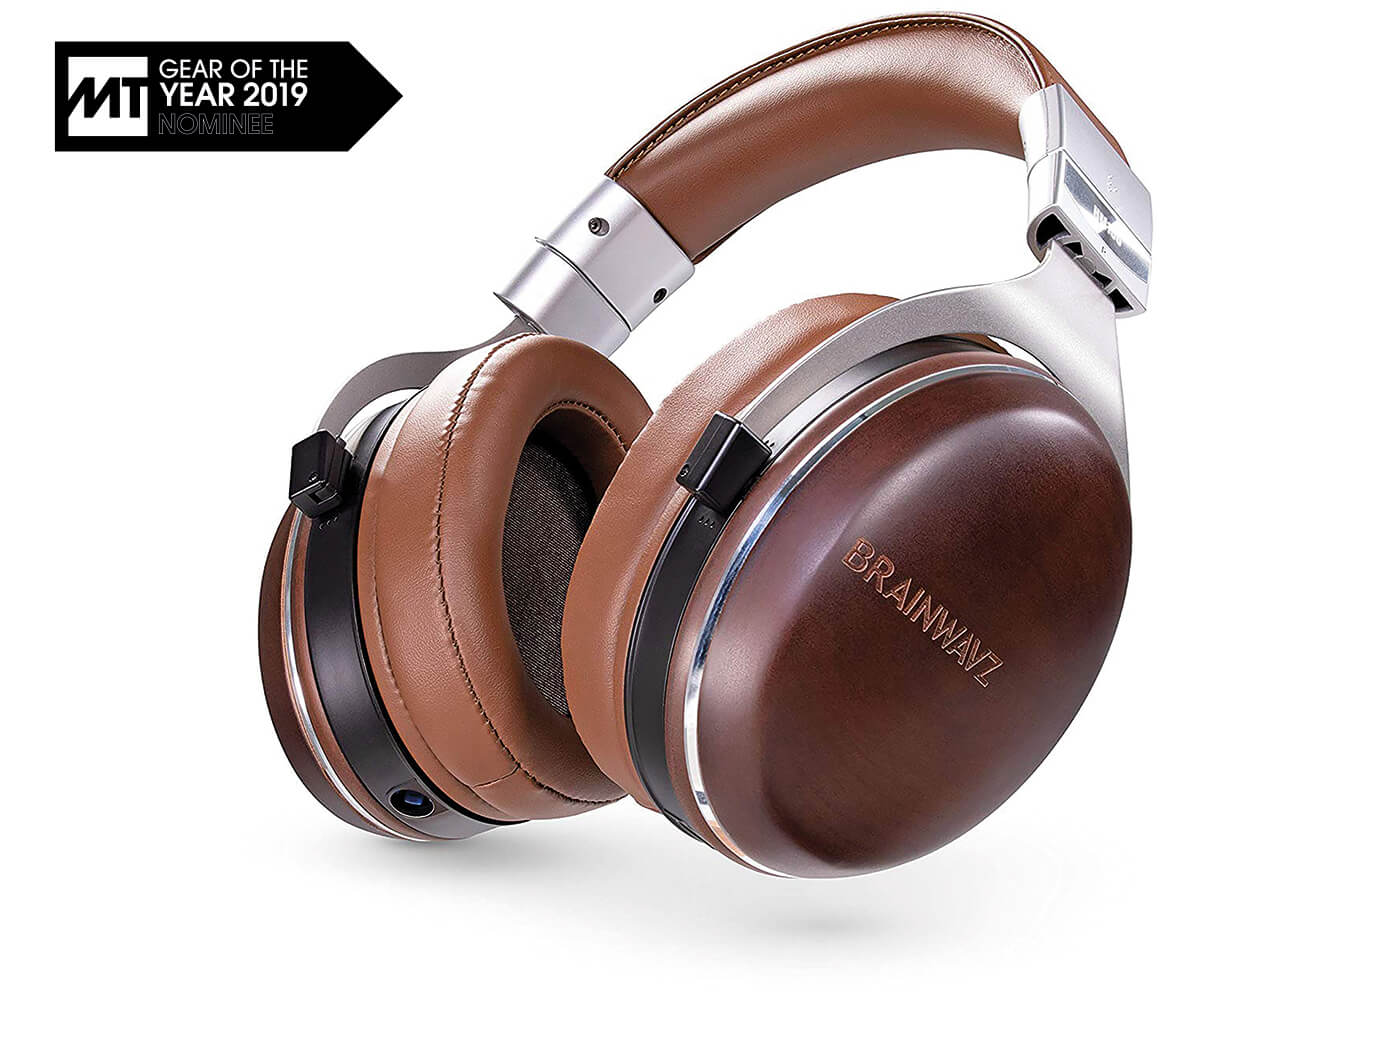 Brainwavz Audio HM100